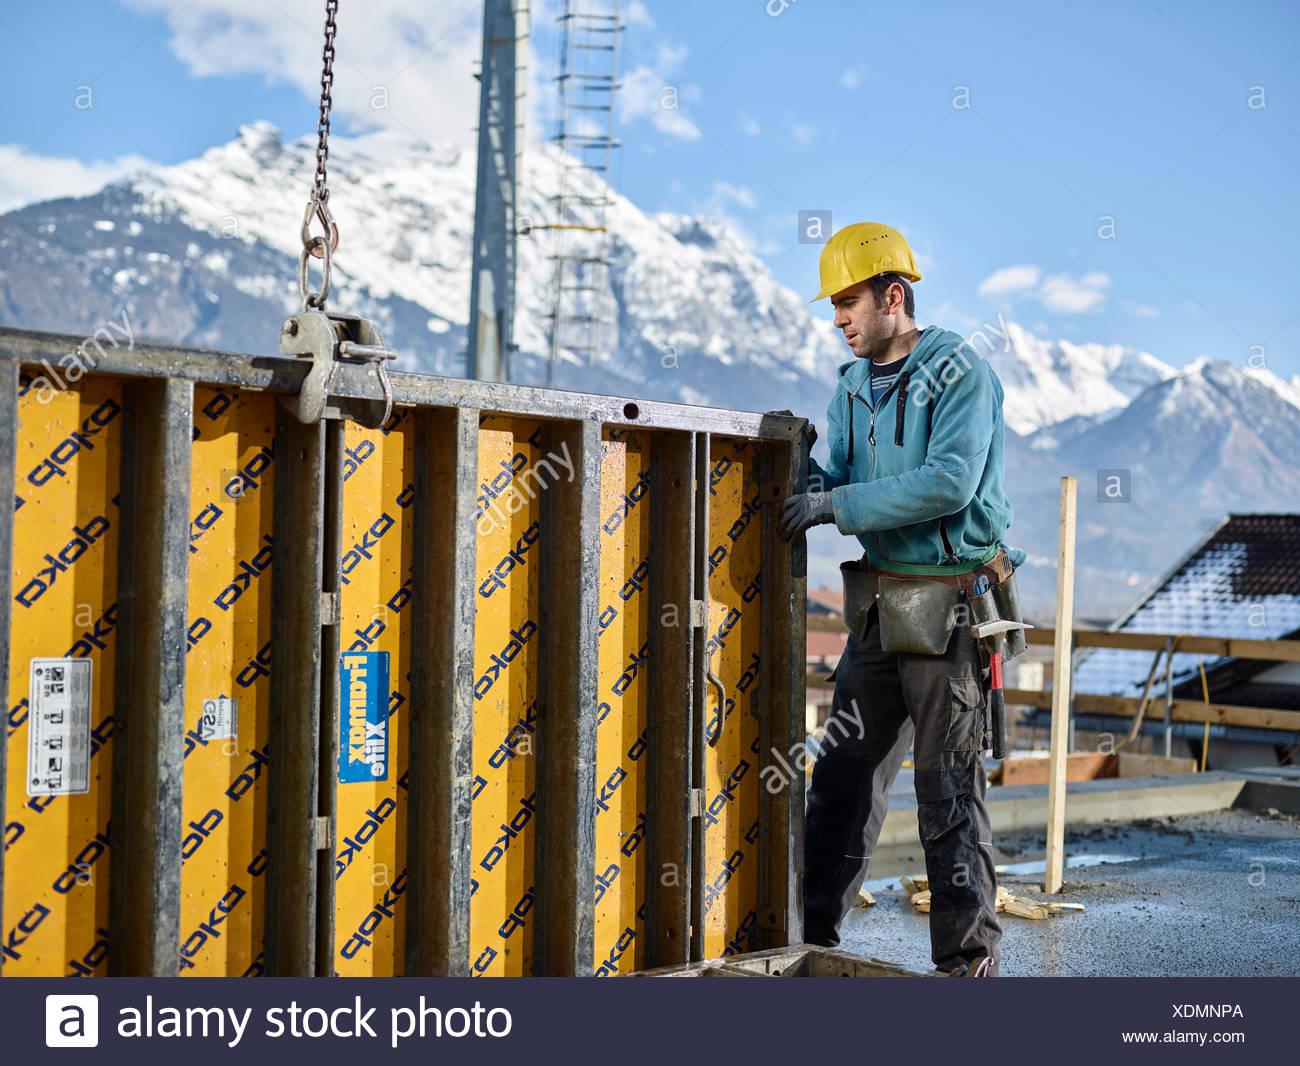 Bauarbeiter Schalung Wand mit Kran heben Vorbereitung gerahmte Schalung, Kolsass, Innsbruck Land, Tirol, Österreich Stockbild